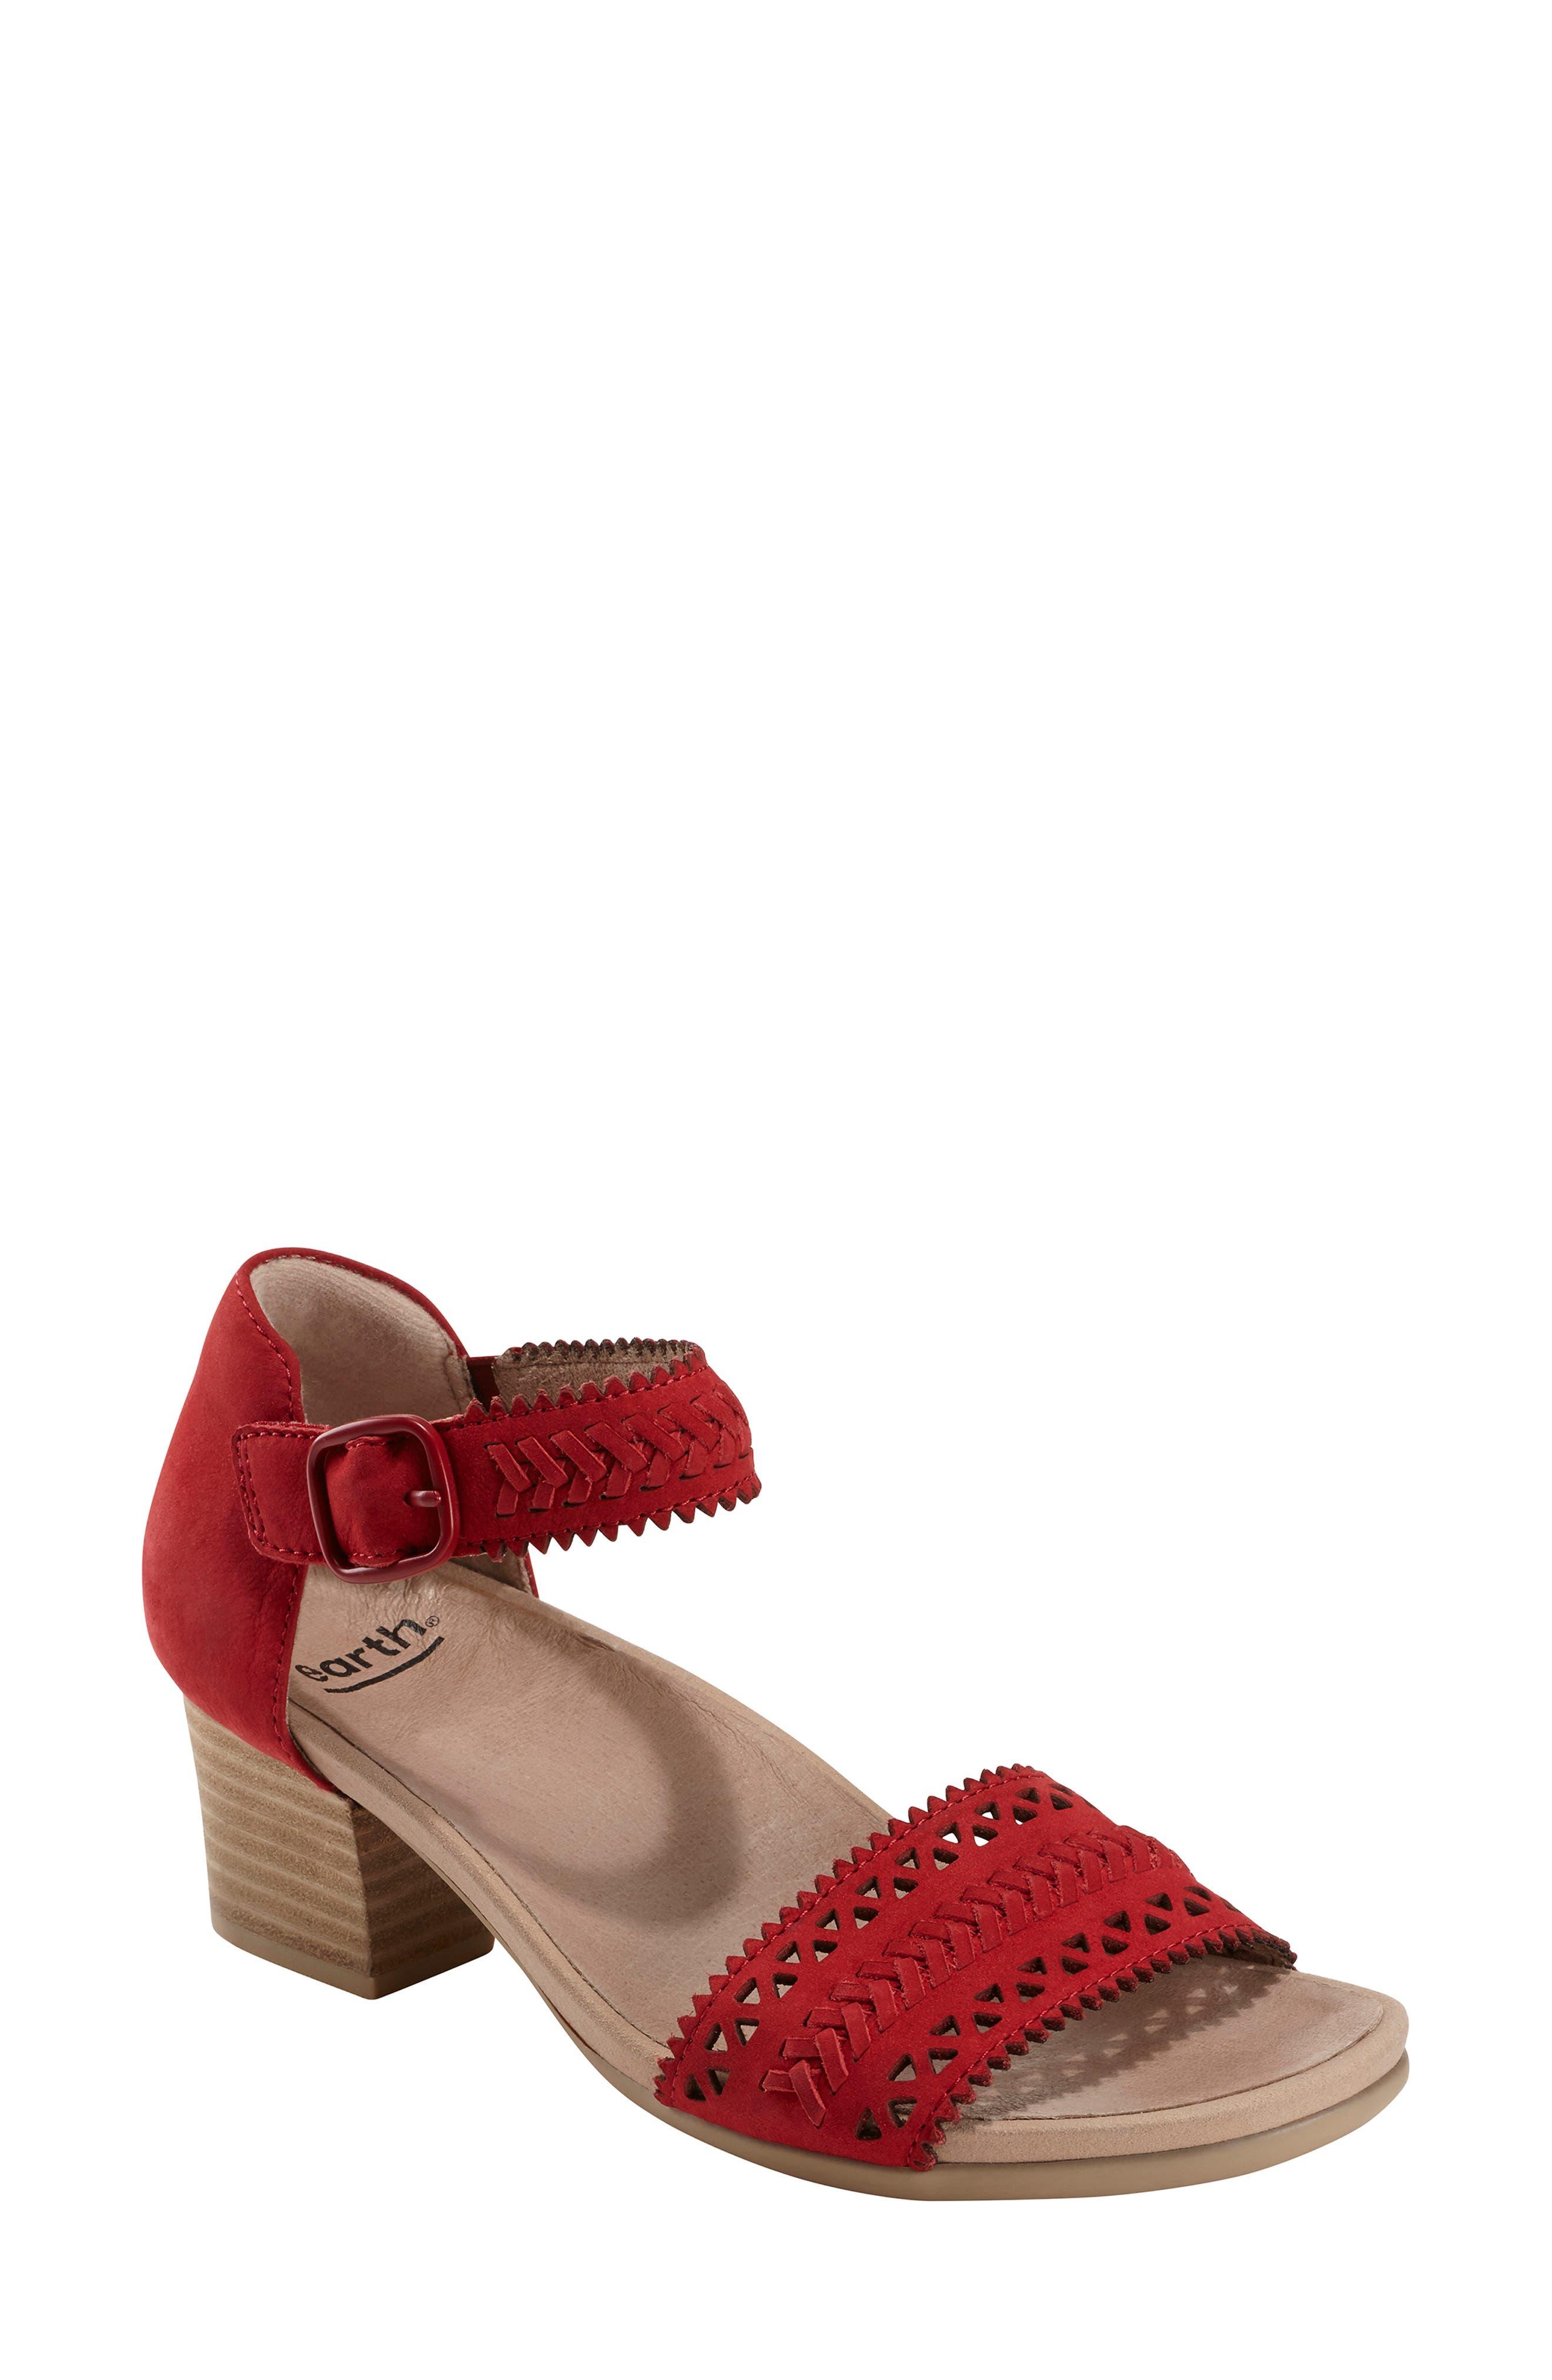 0d2476db16dbd8 earth sandals